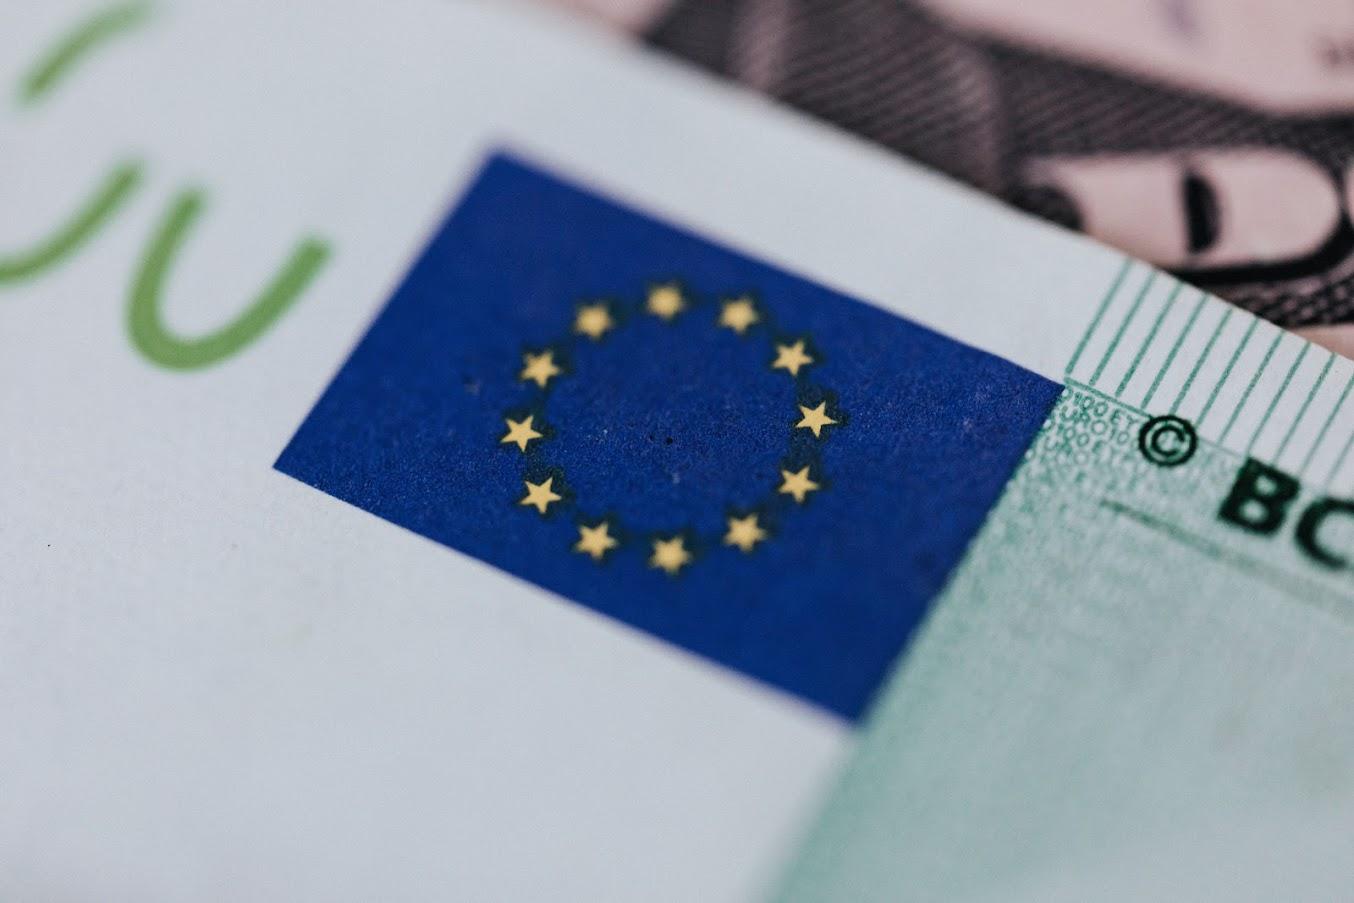 Fondi europei - Photo credit: Foto di Karolina Grabowska da Pexels